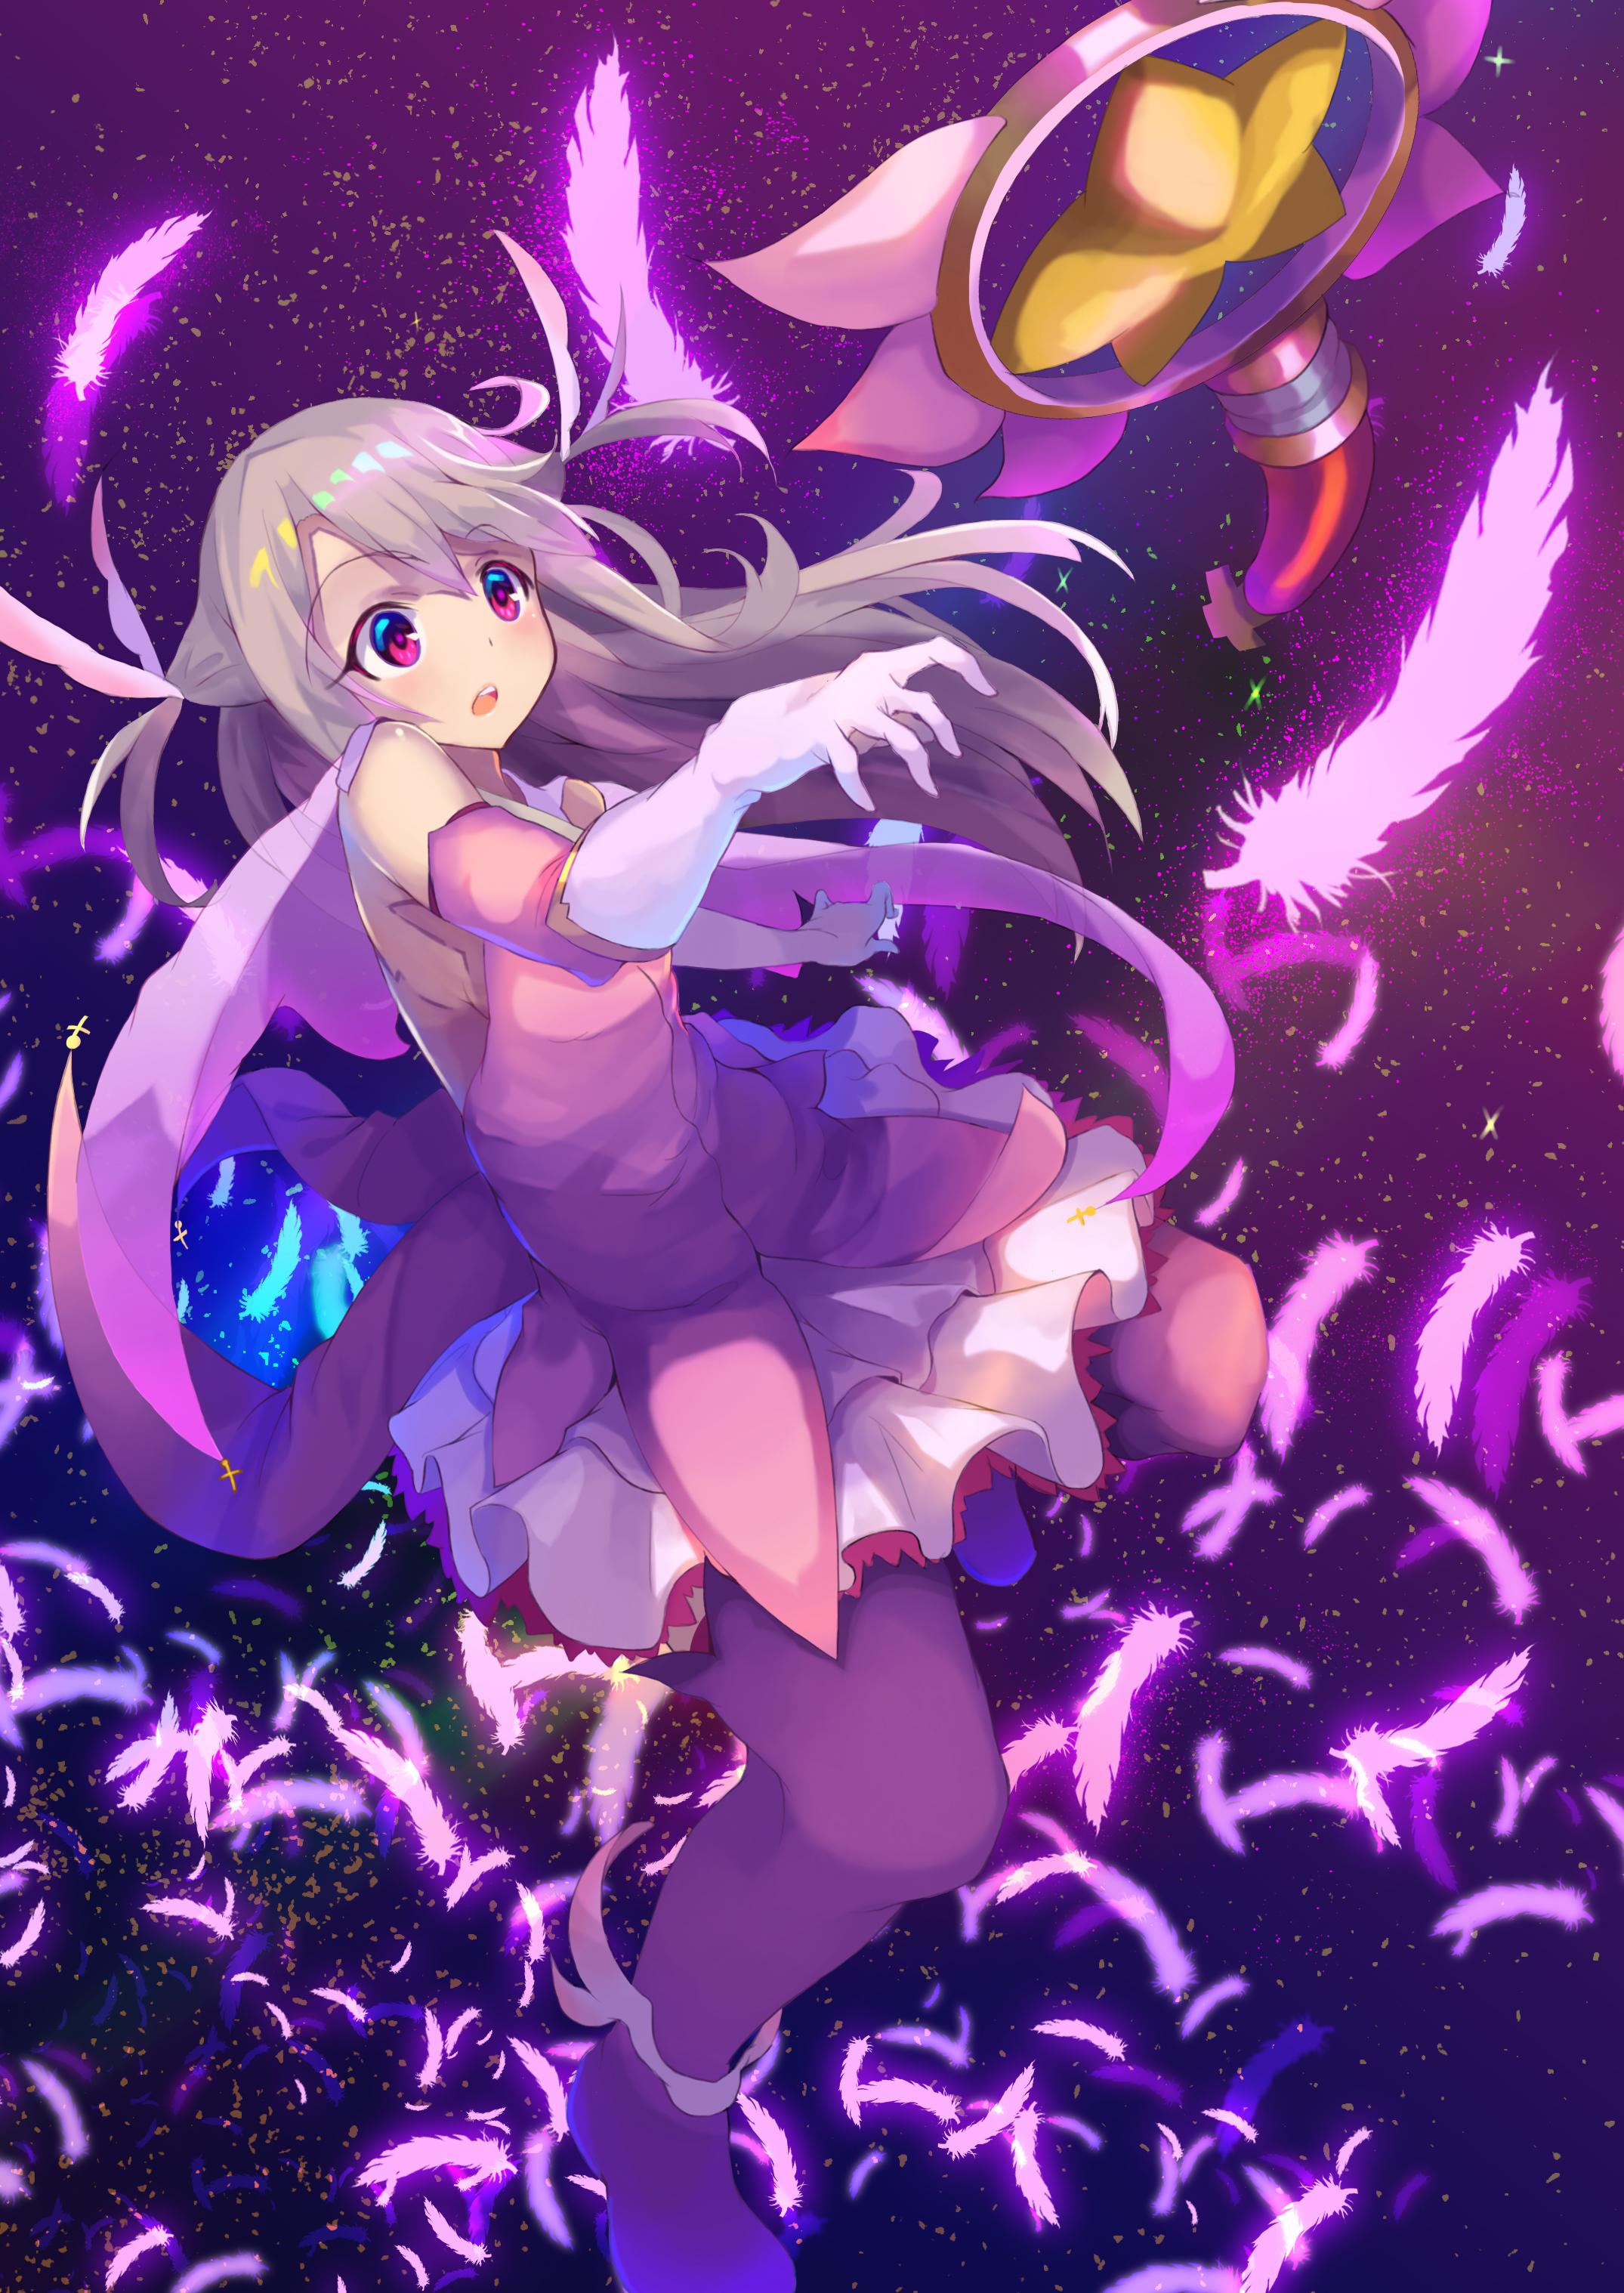 Wallpaper Fate Series Fate Kaleid Liner Prisma Illya Anime